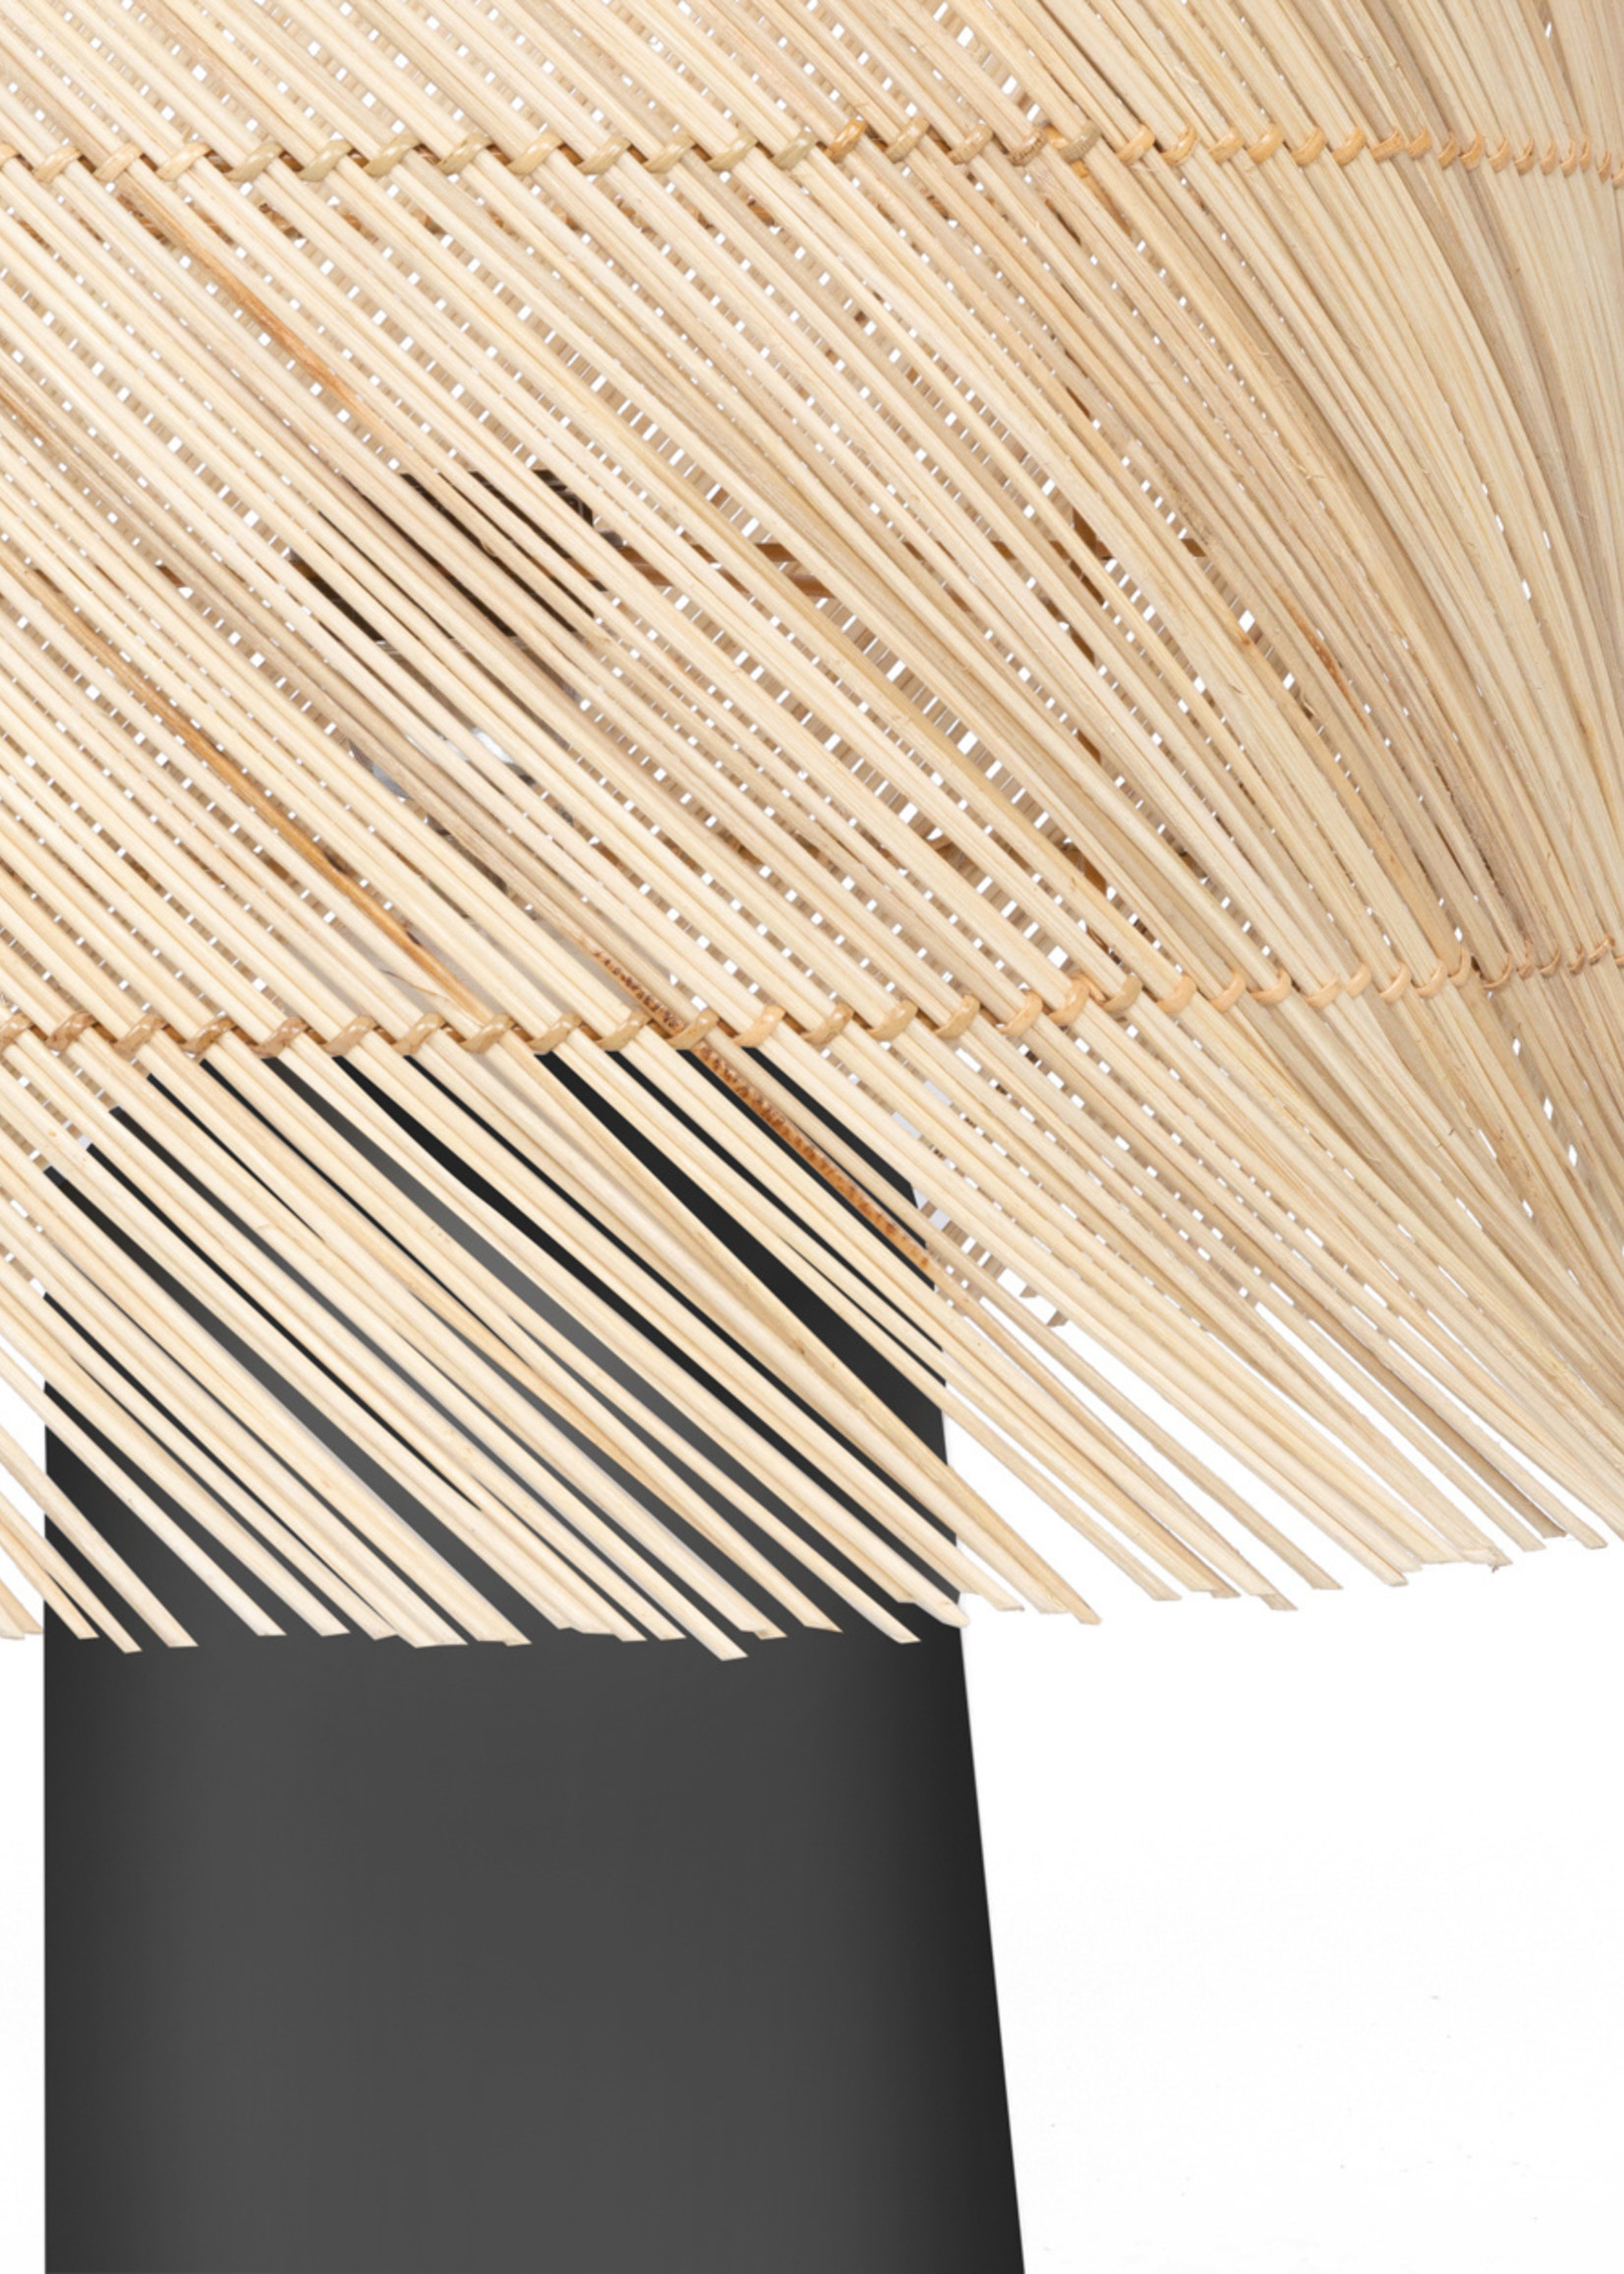 The Rattan Table Lamp - Black Natural